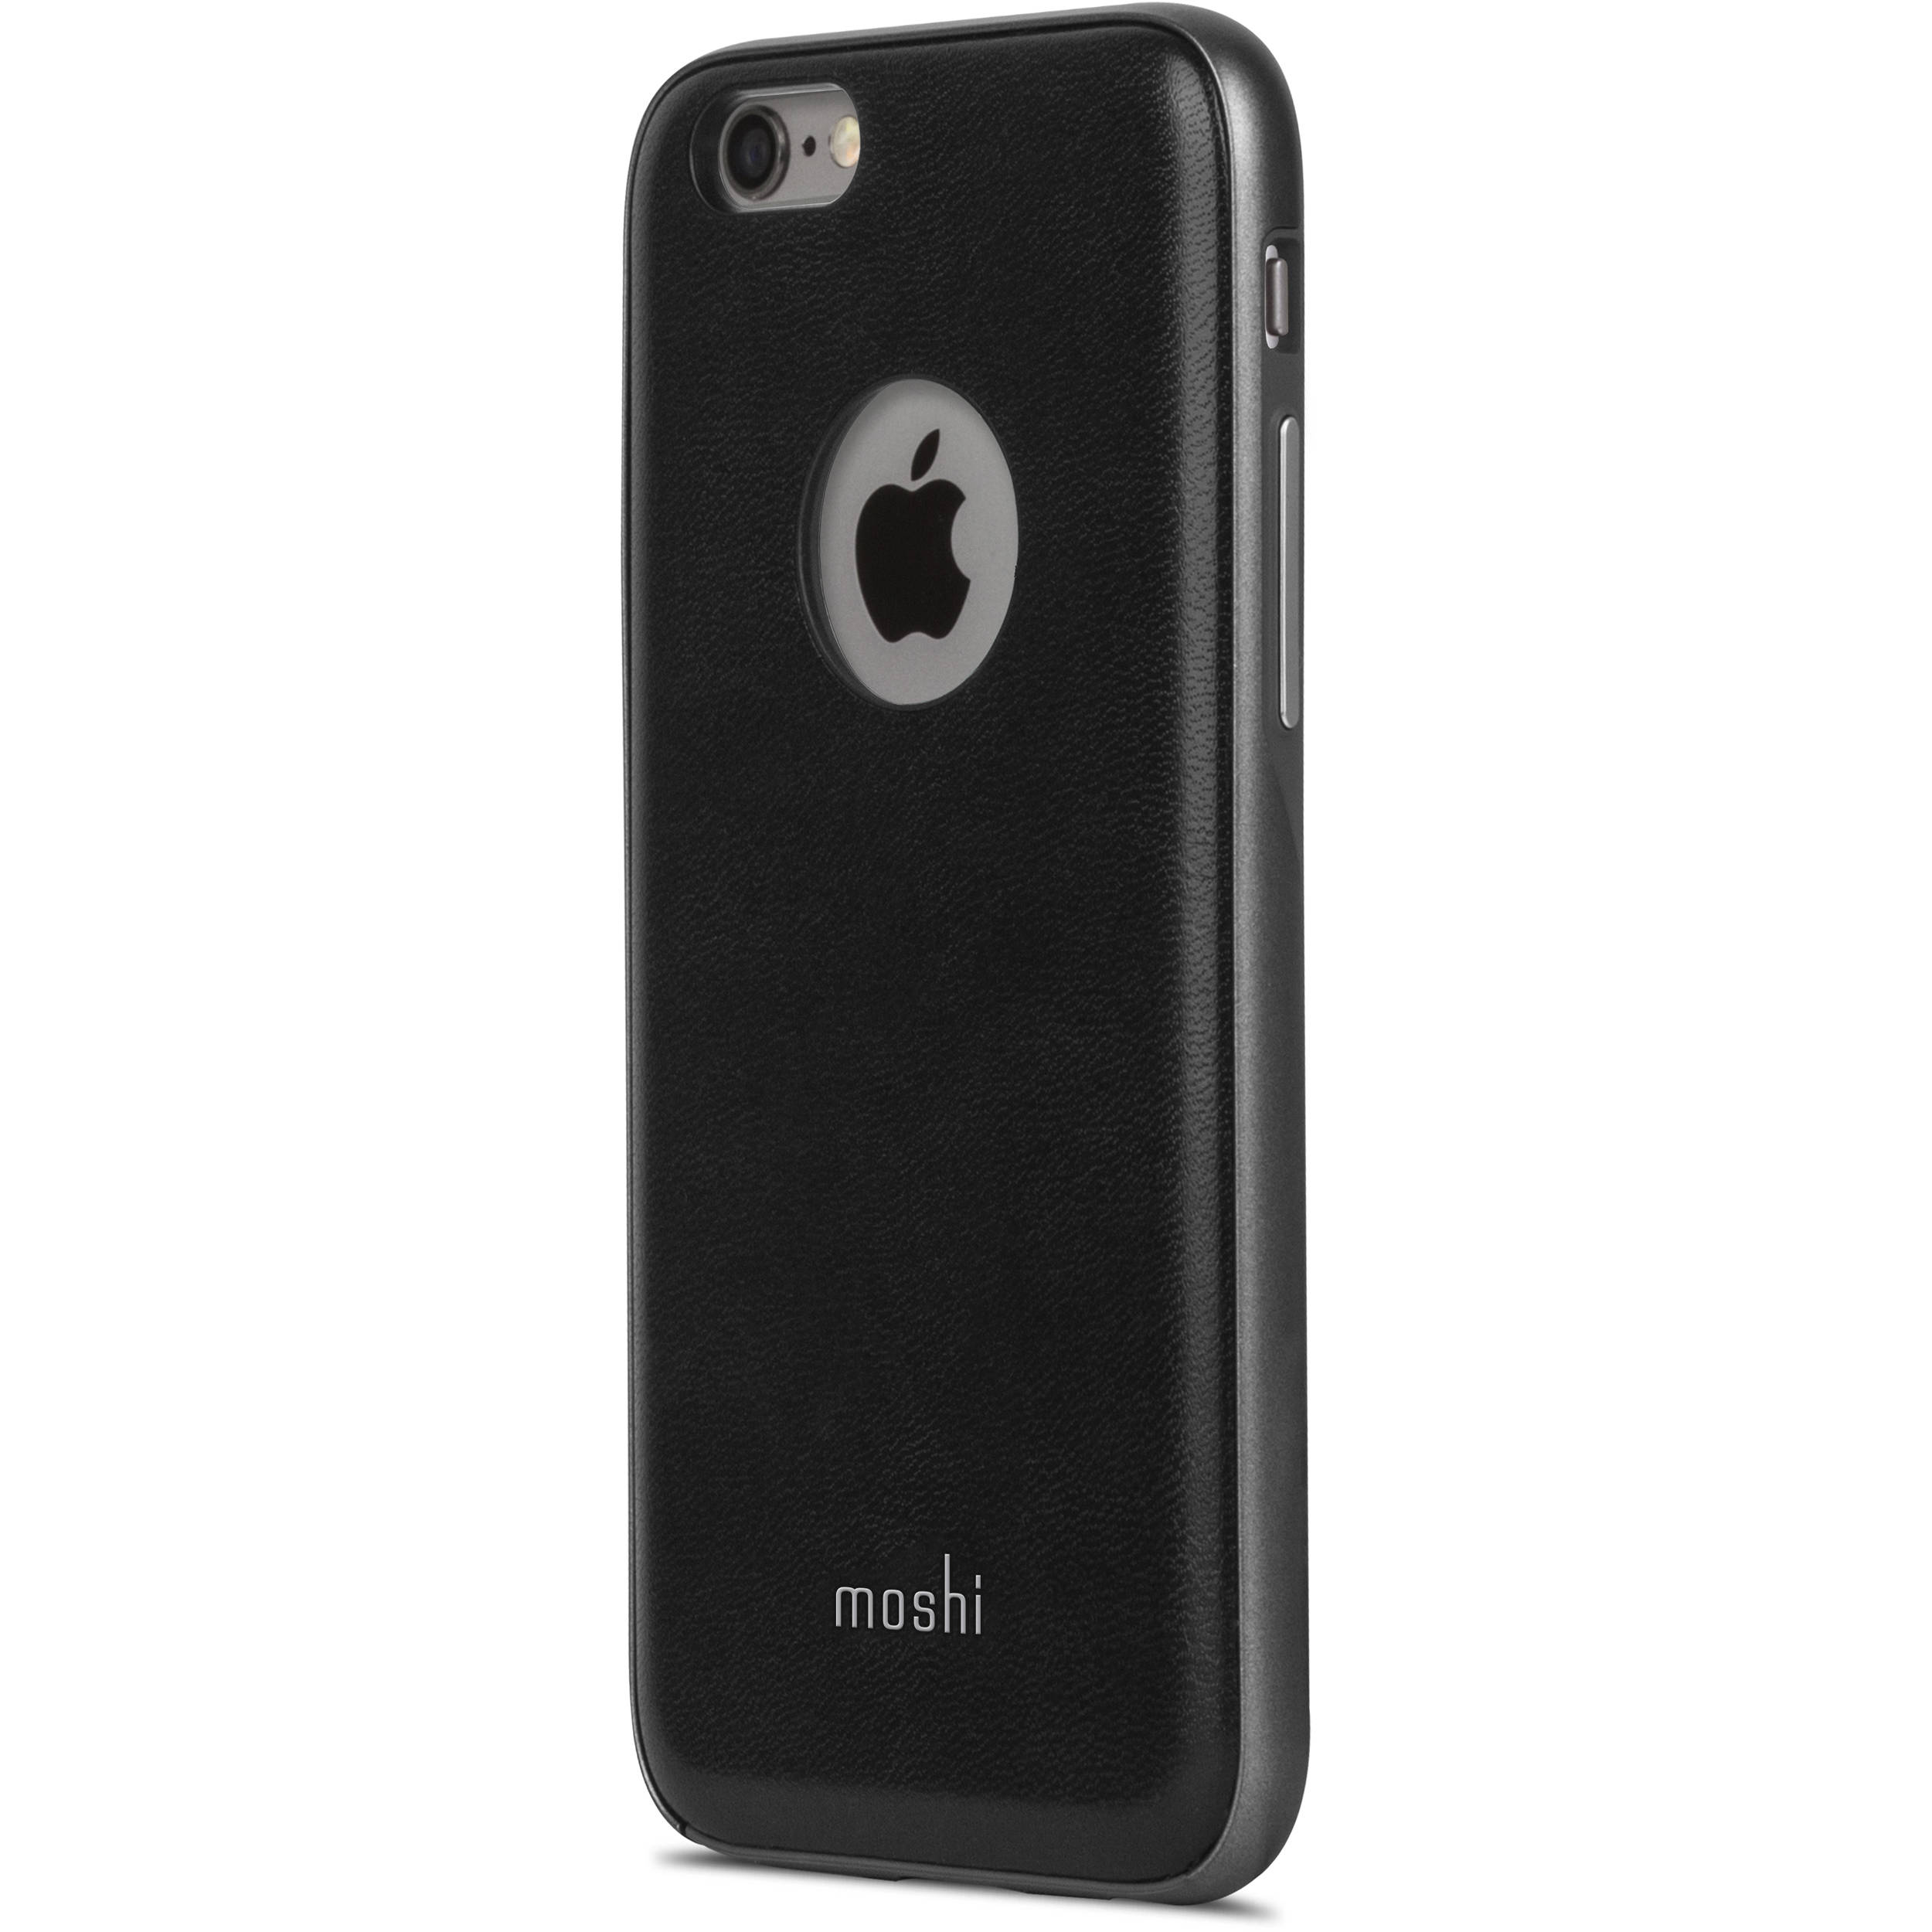 moshi iglaze napa case for iphone 6 6s black 99mo079002 b h. Black Bedroom Furniture Sets. Home Design Ideas